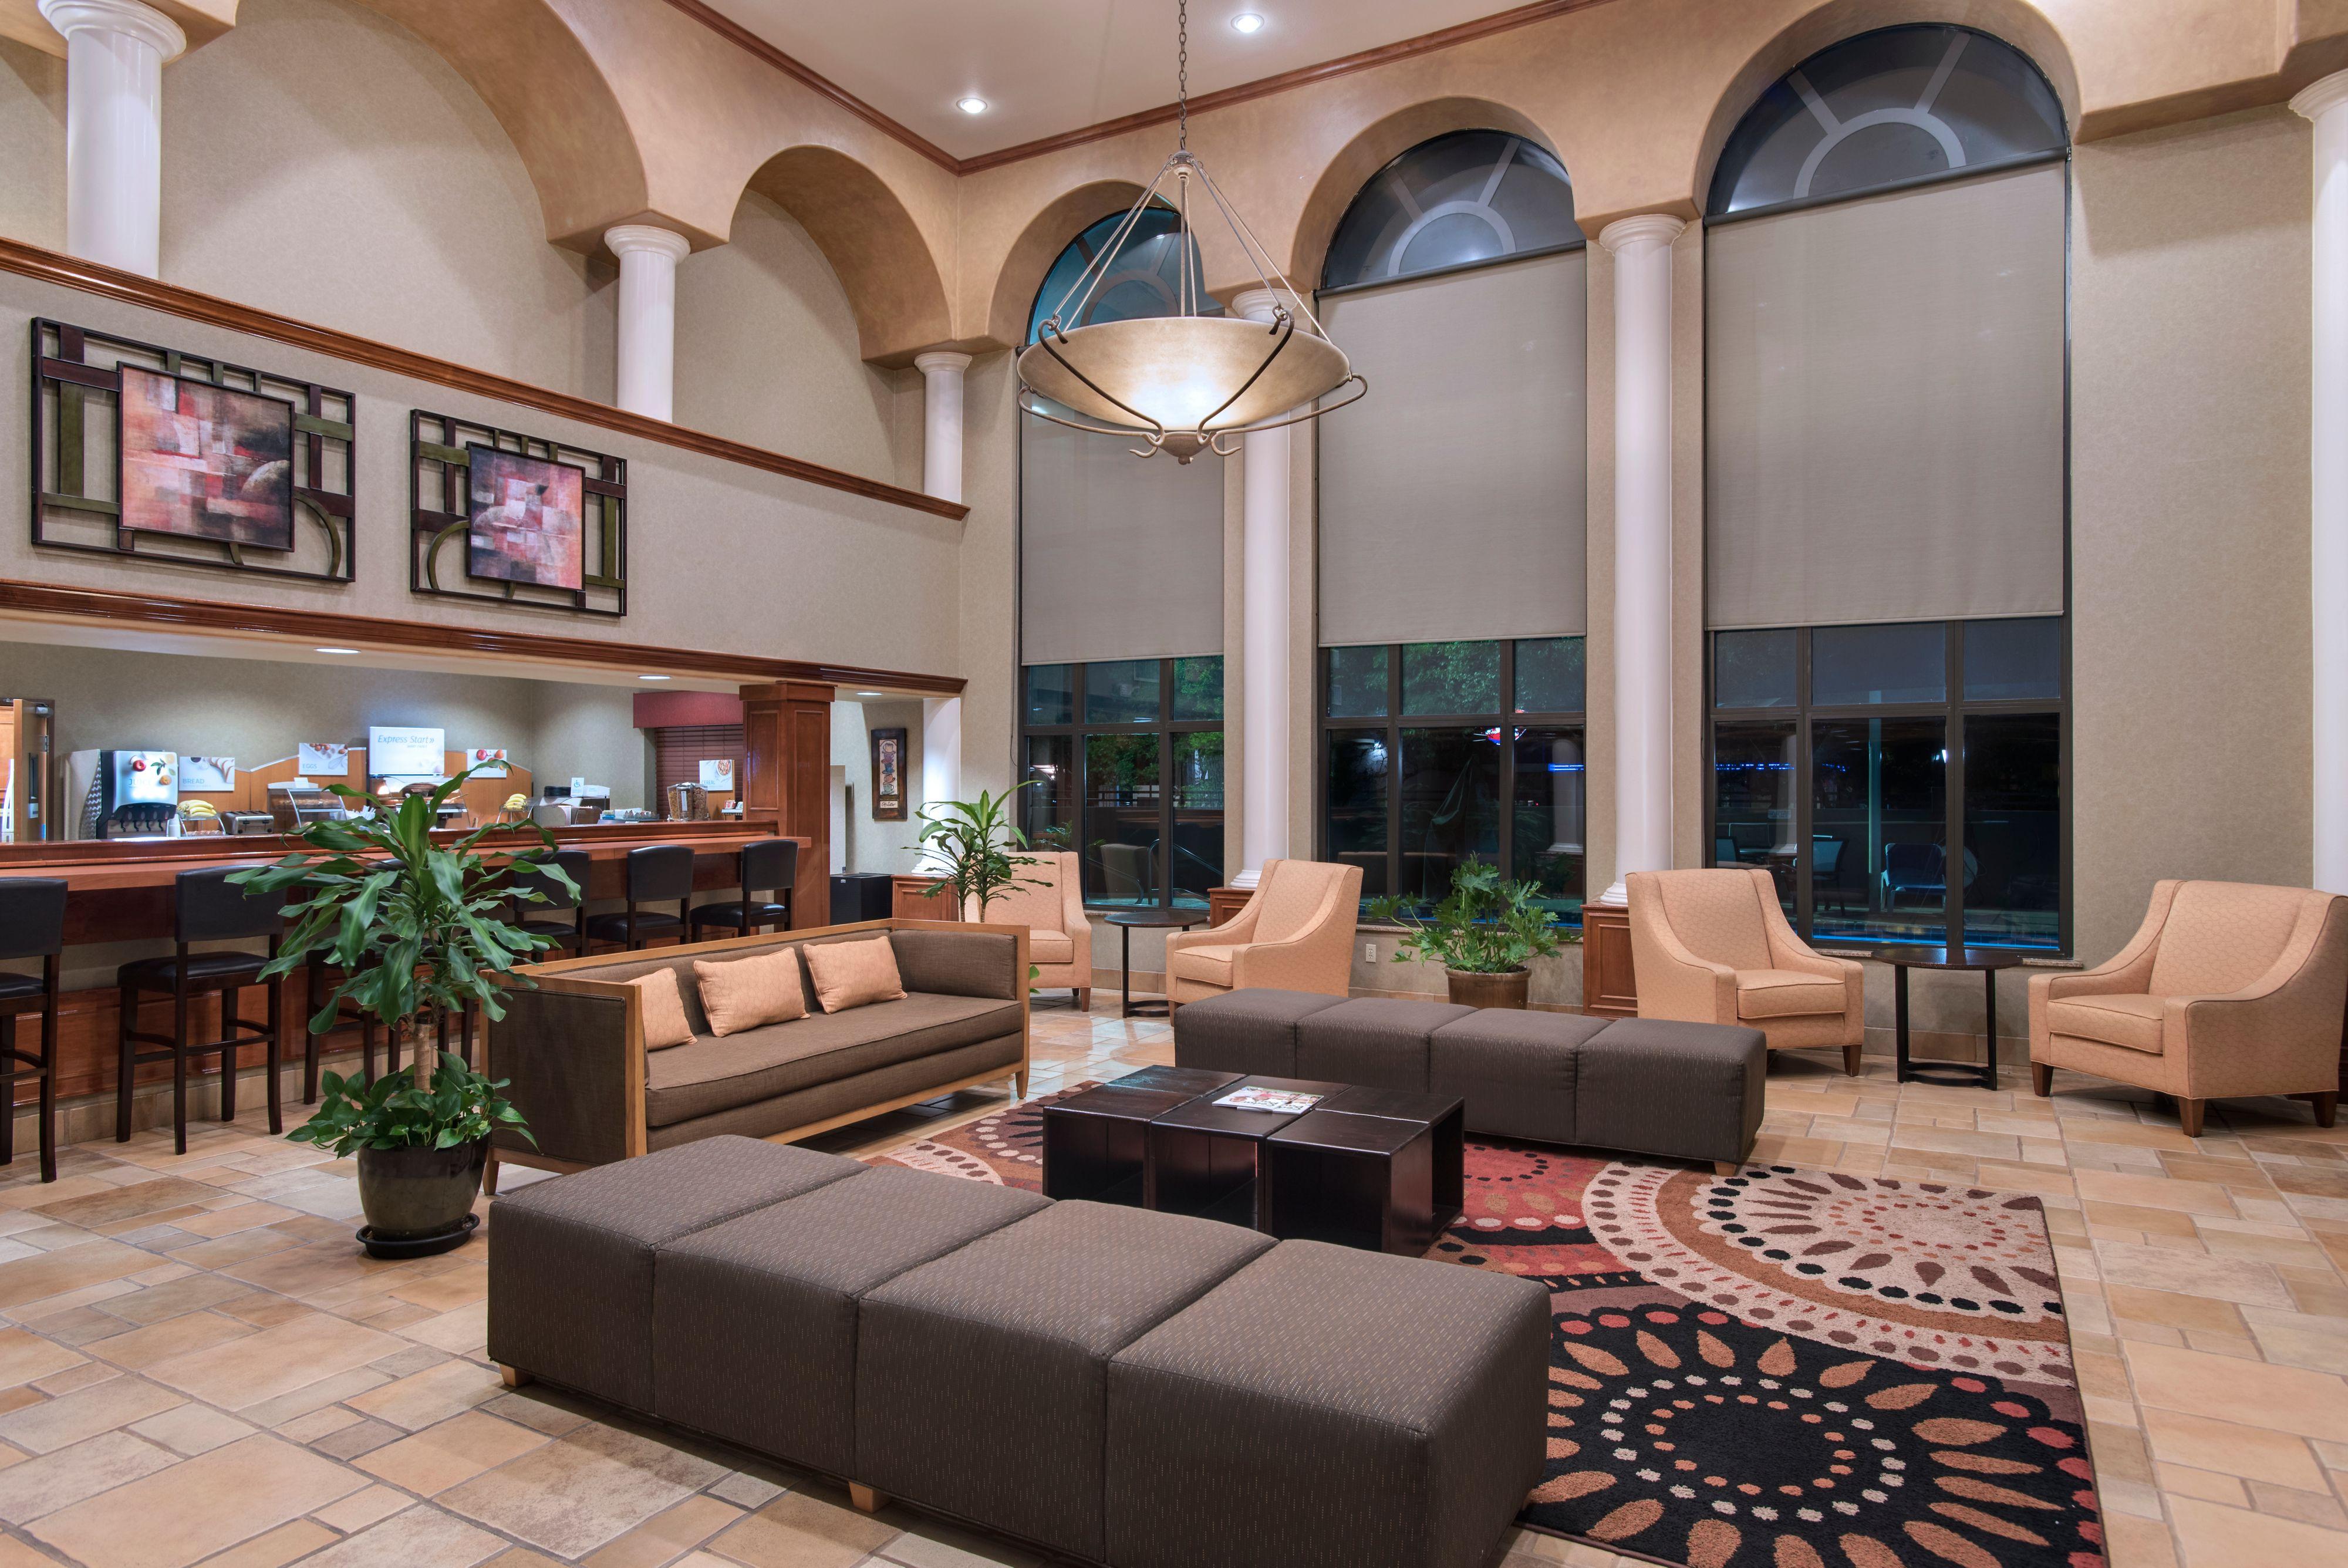 Holiday Inn Express & Suites Cedar Park (Nw Austin) image 4